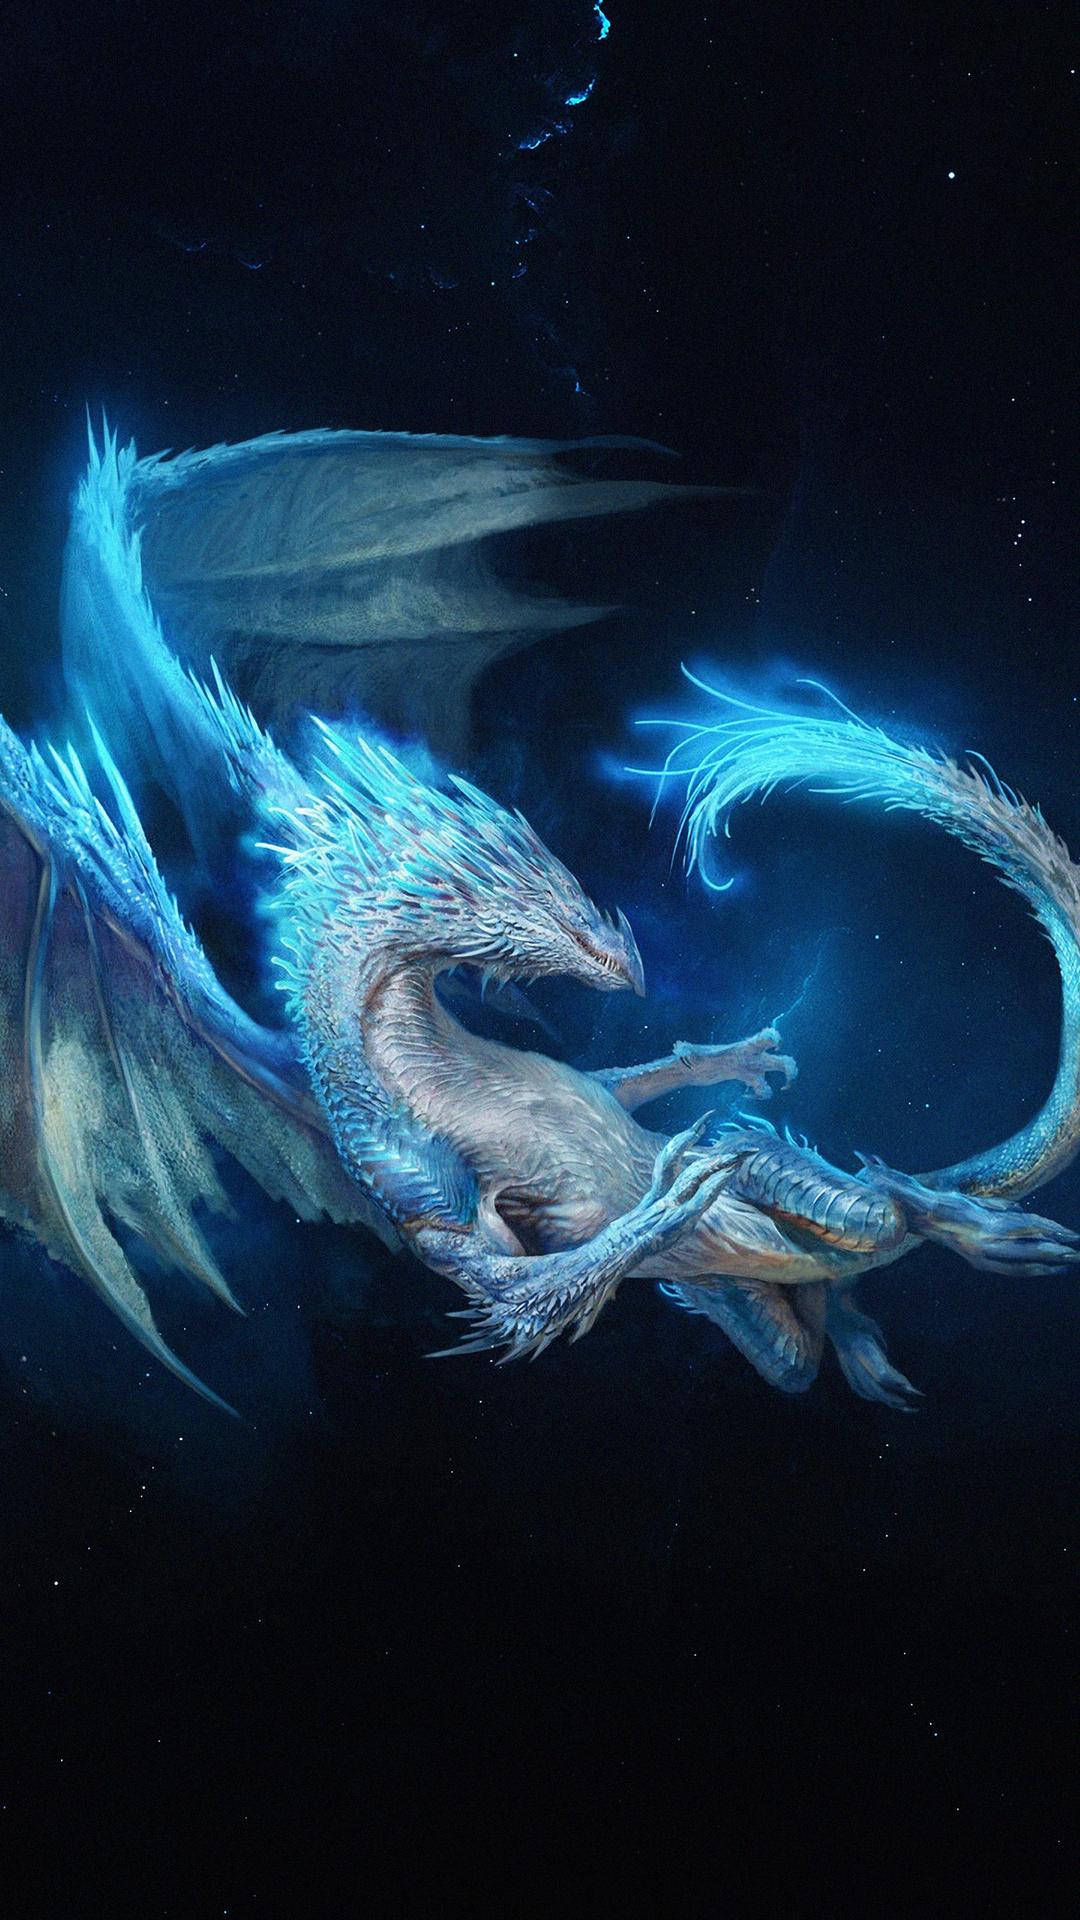 dragon-creature-4k-vu.jpg